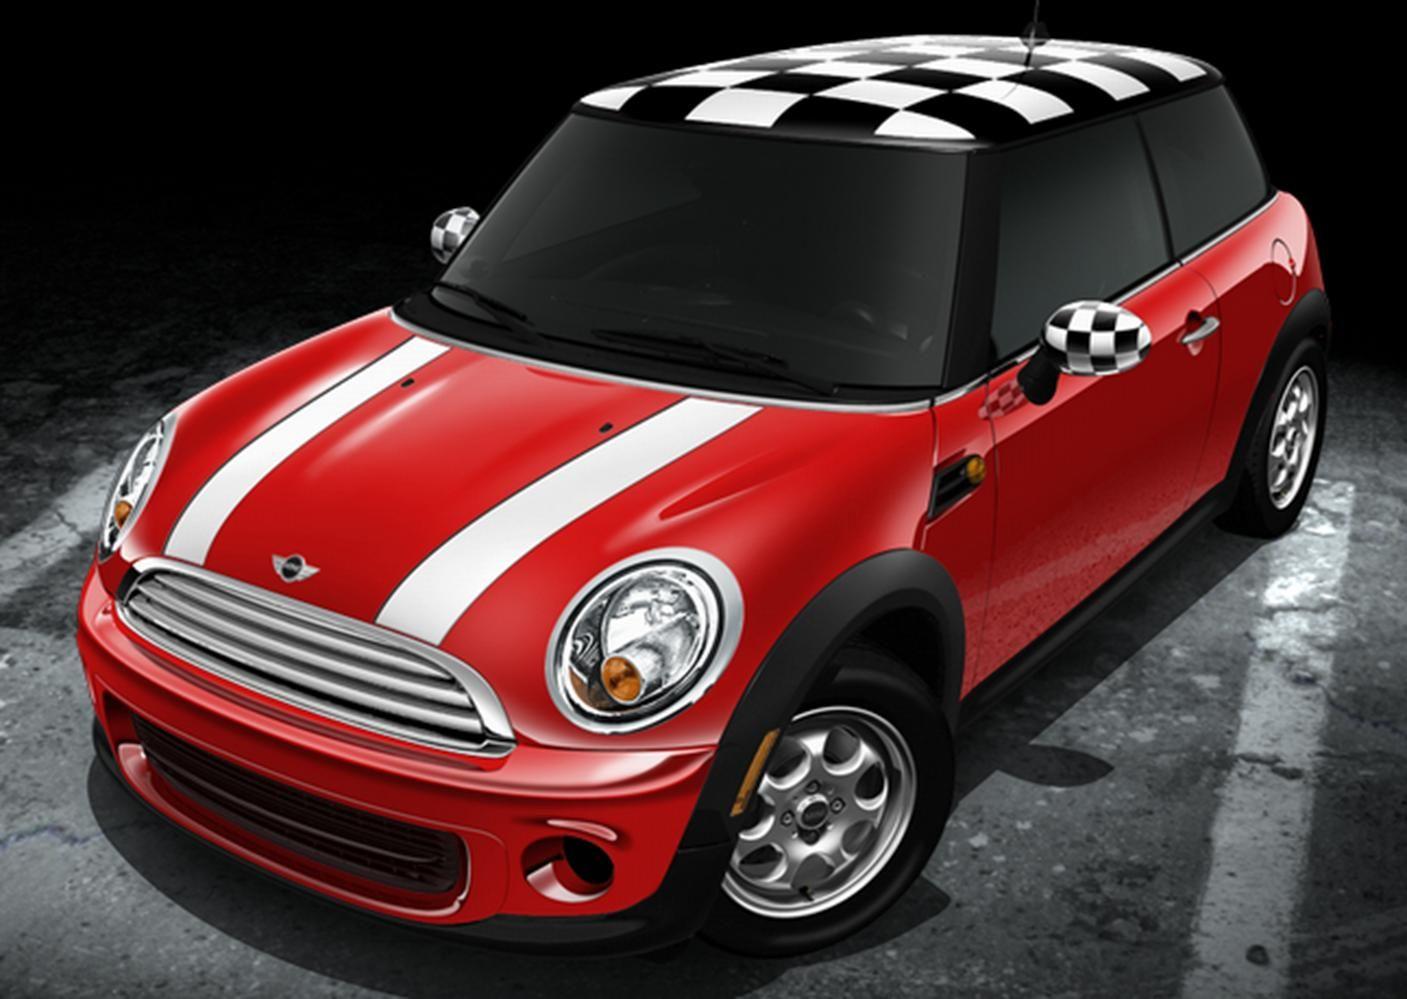 Mini Cooper Usa >> Mini Cooper I Want One Mini Usa Mini Cars